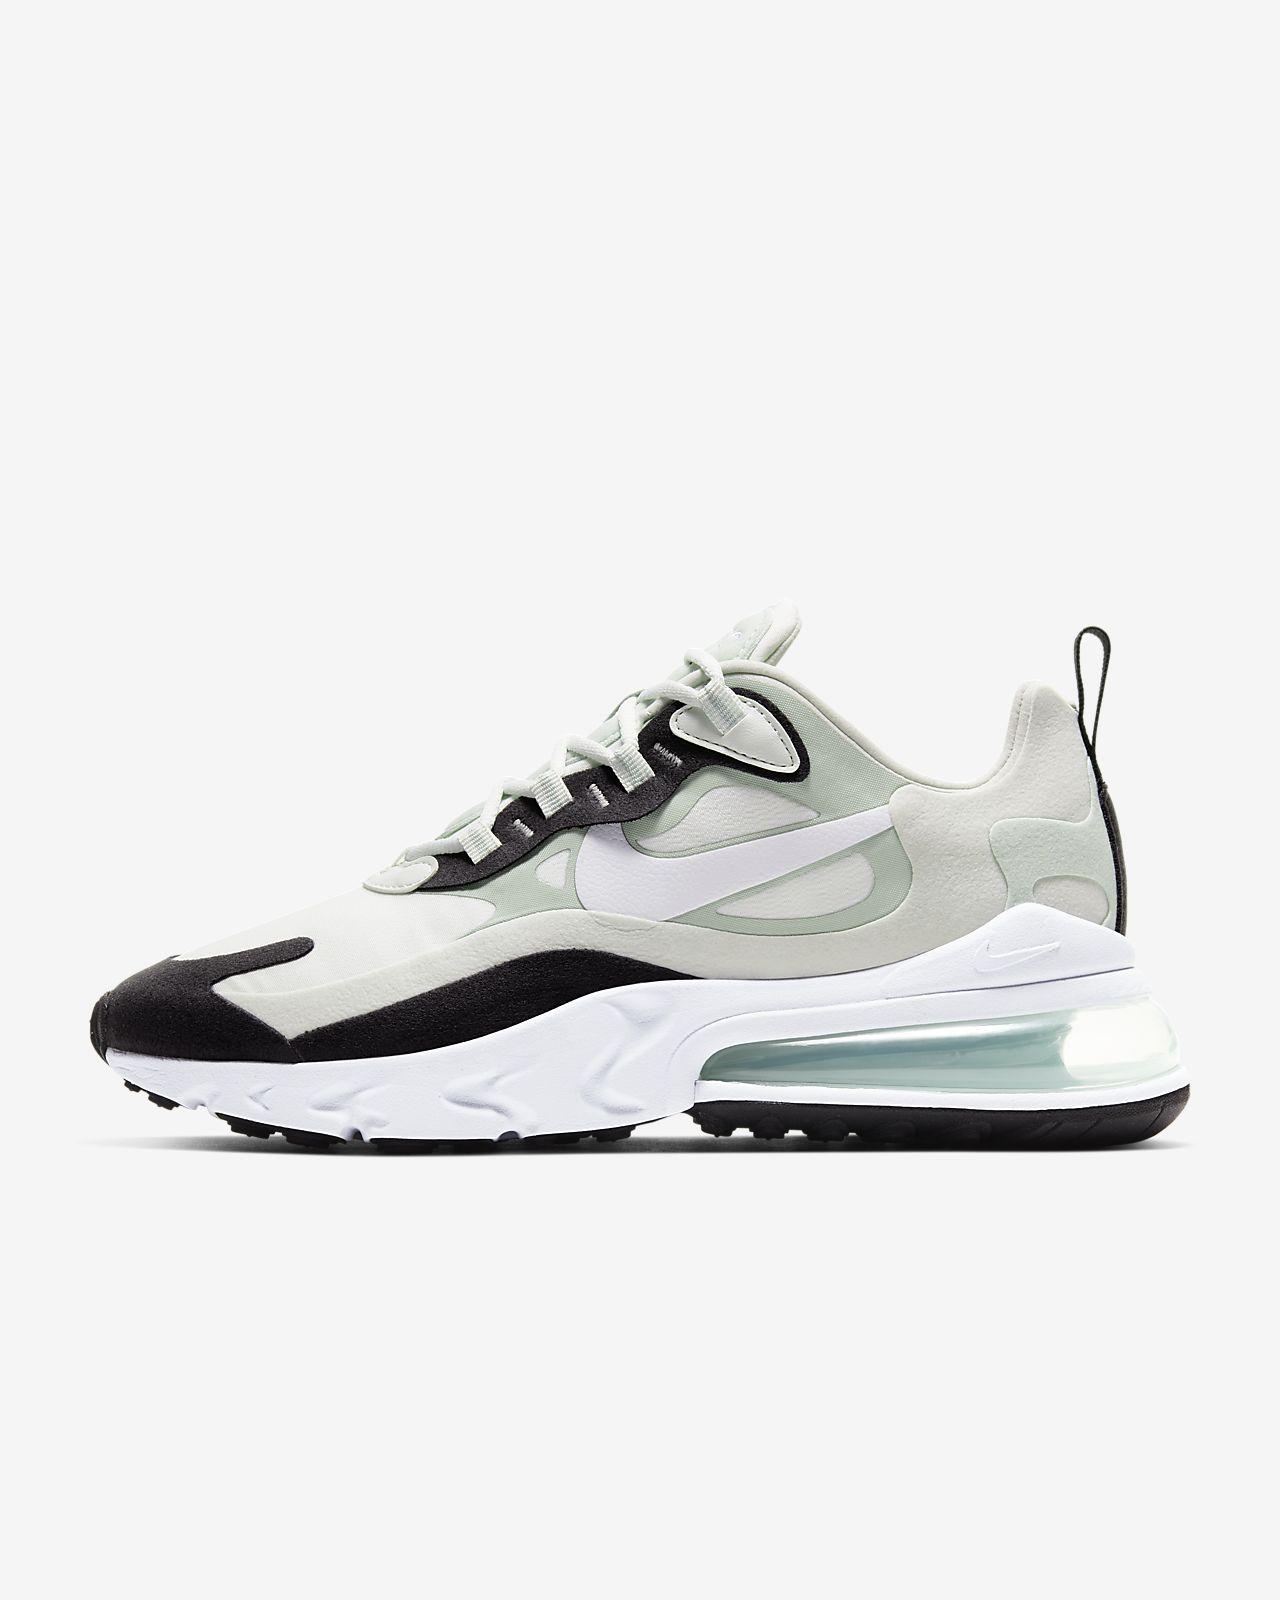 Kvinder Tilbud Nike Sportswear Sko. DK.